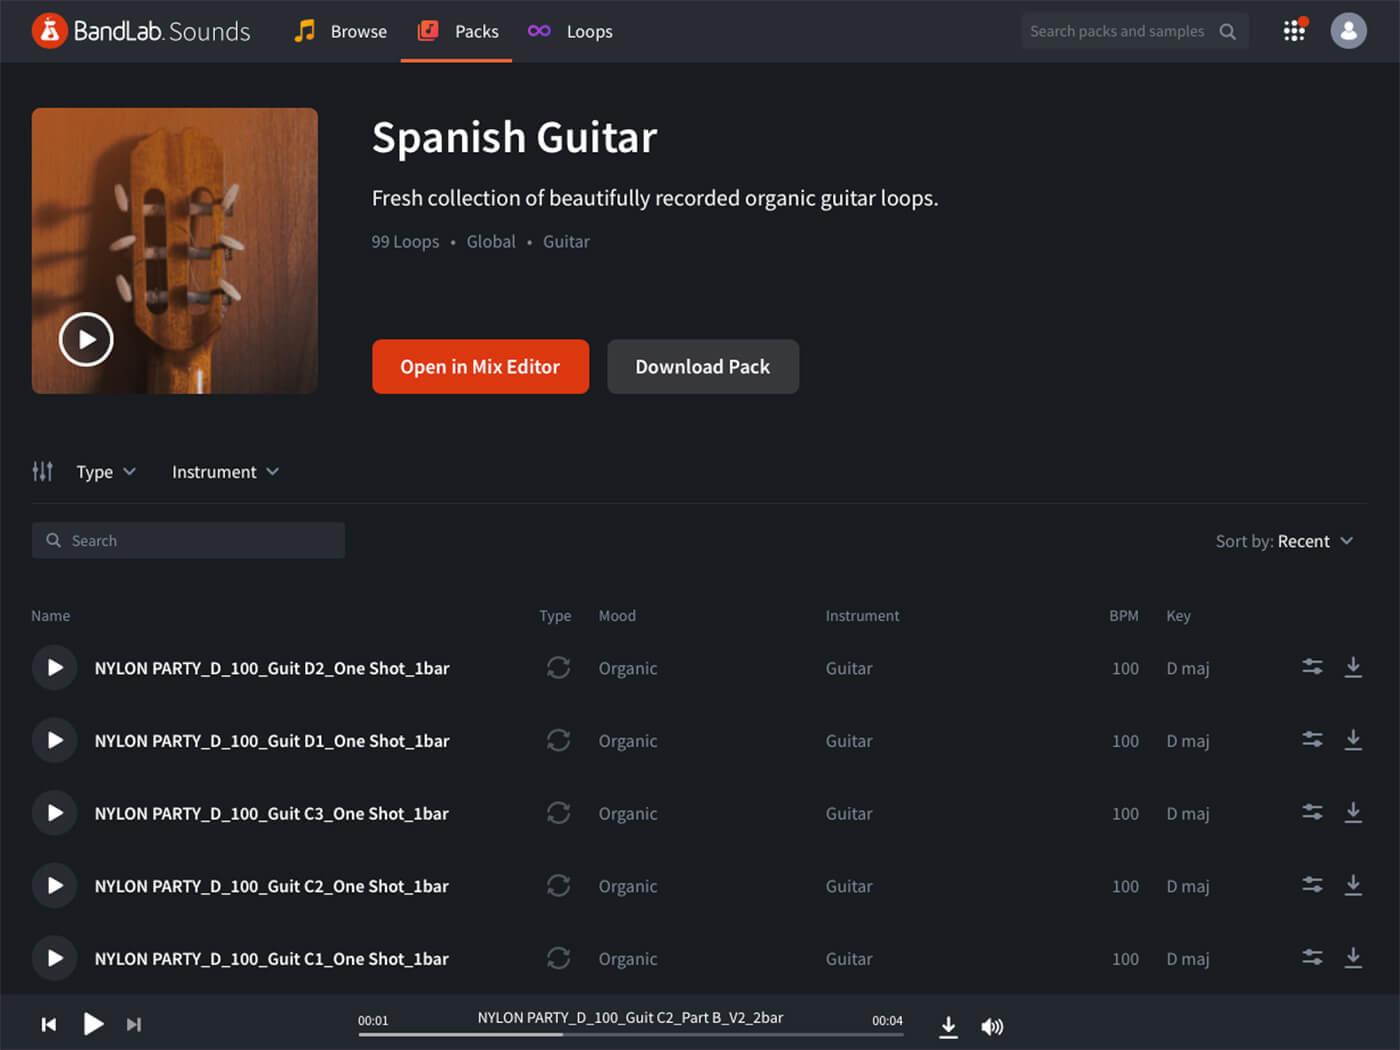 BandLab Sounds - Spanish Guitar